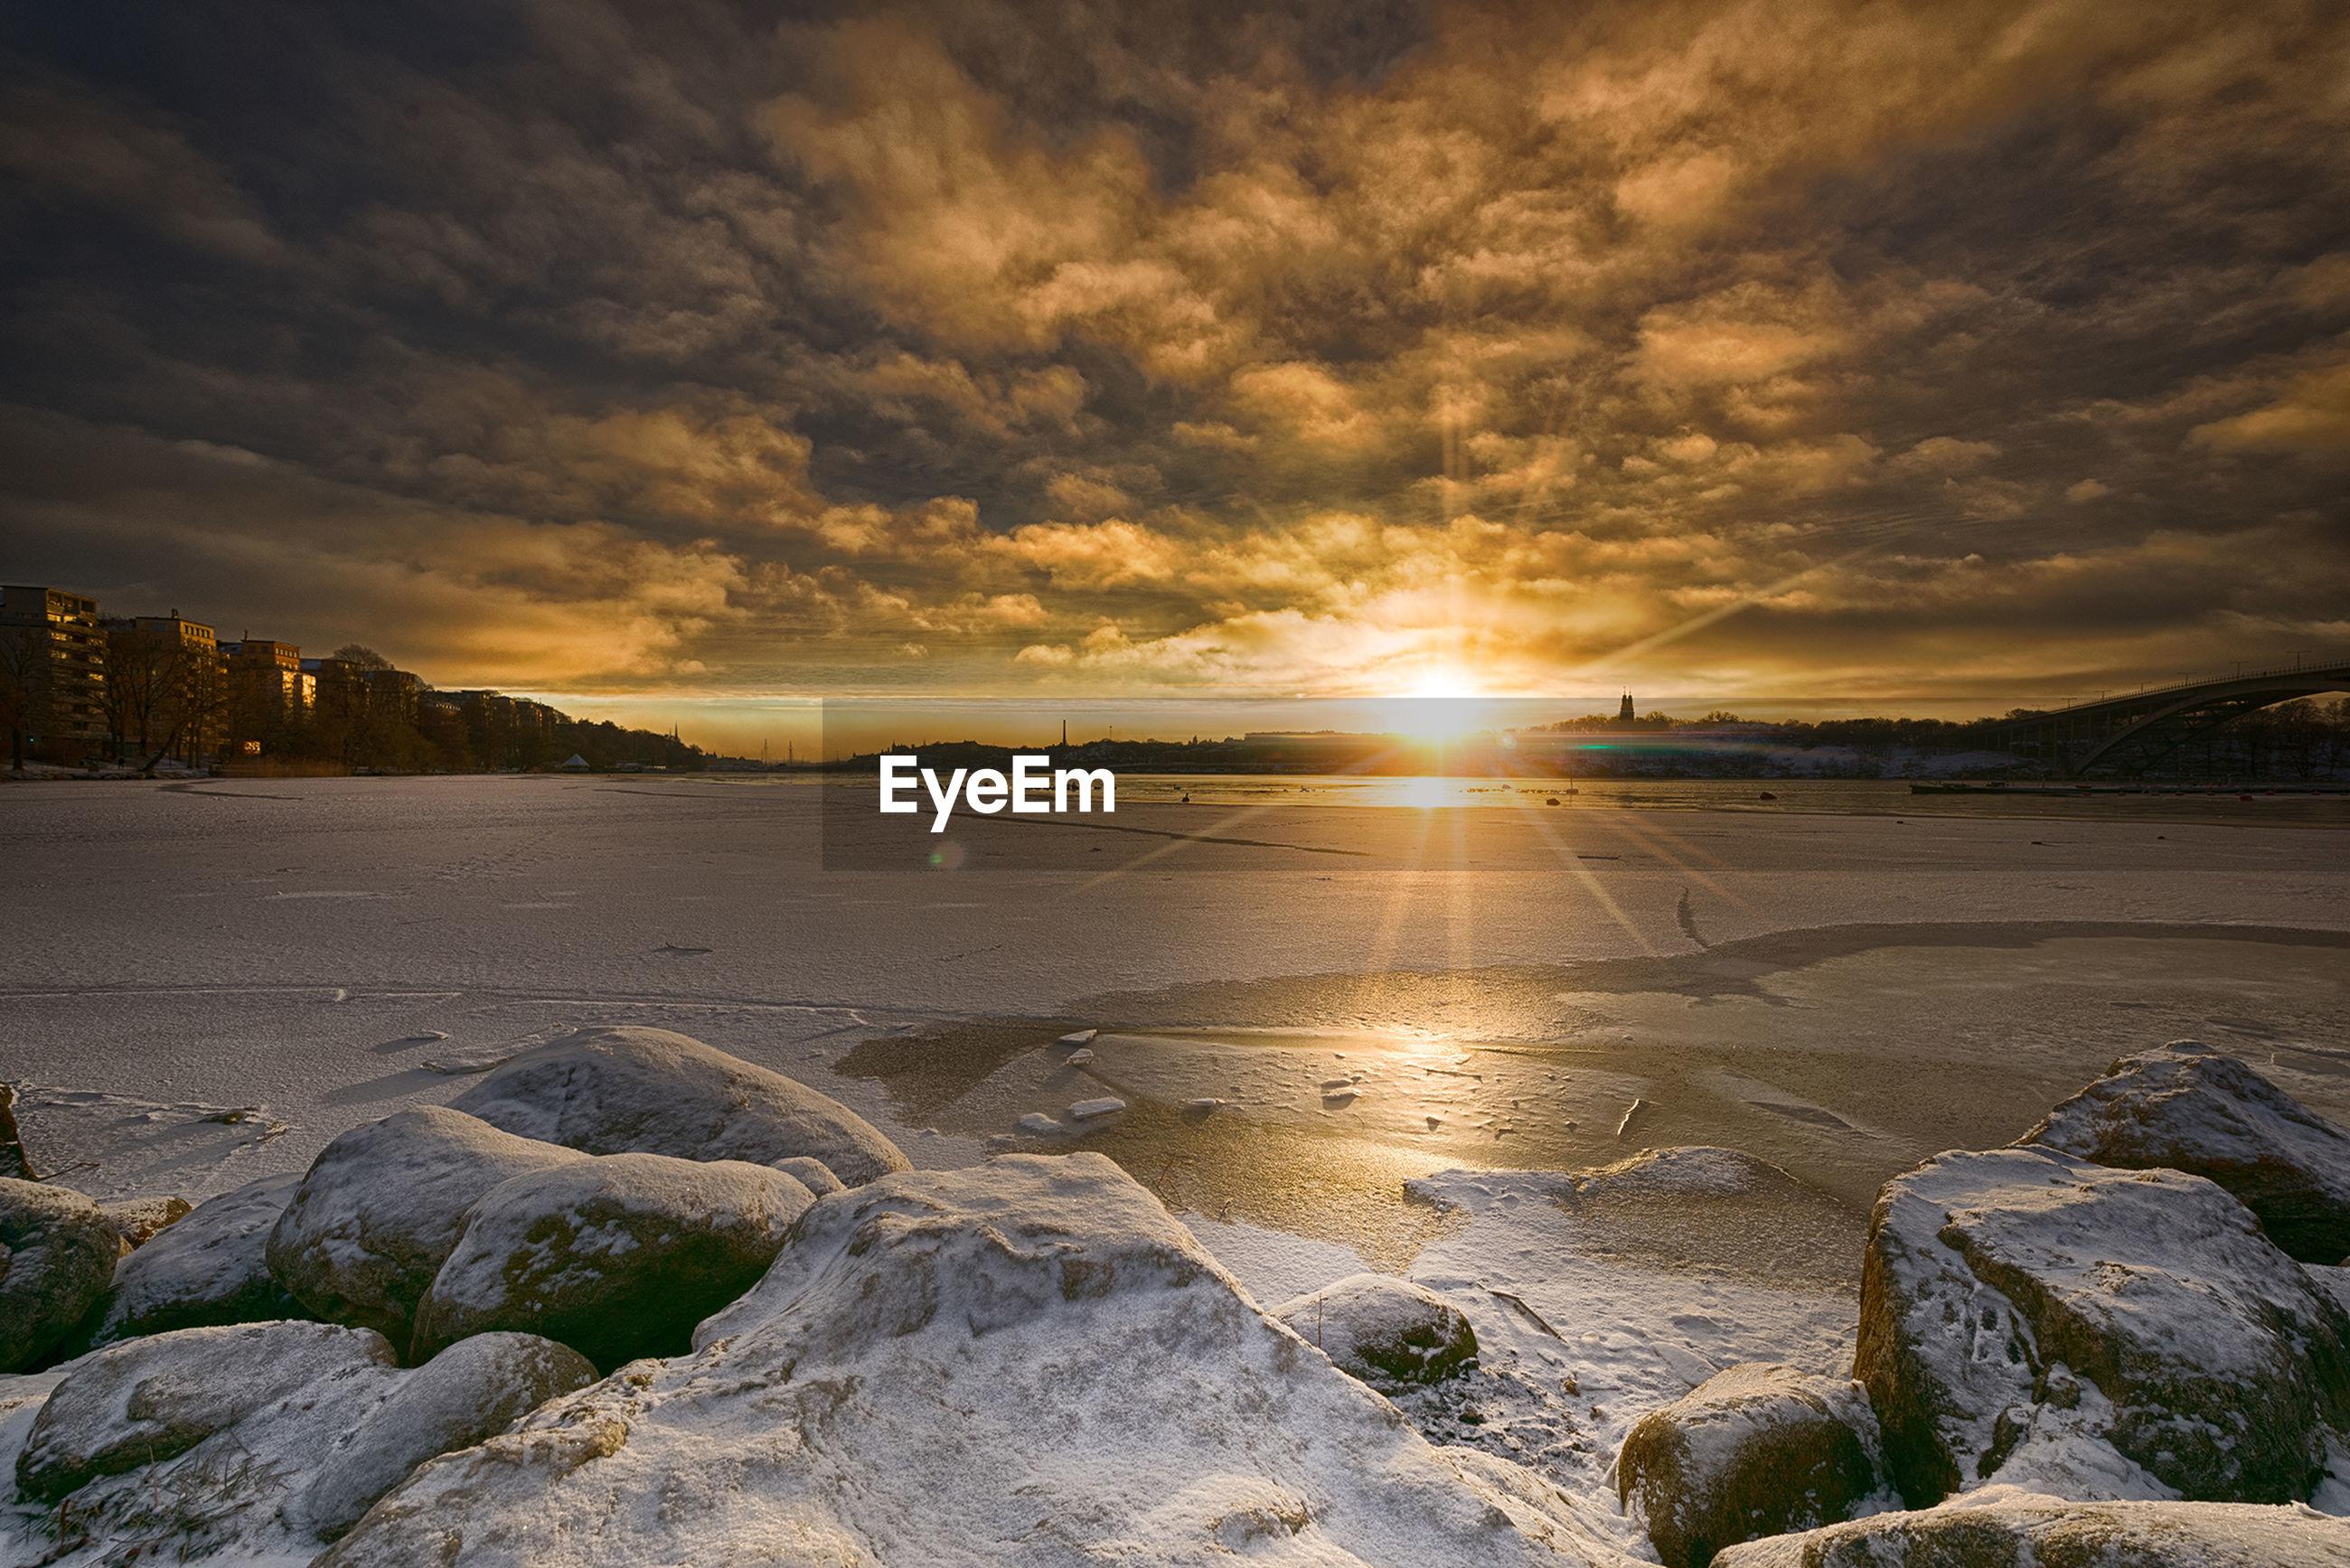 SCENIC VIEW OF BEACH AGAINST ROMANTIC SKY